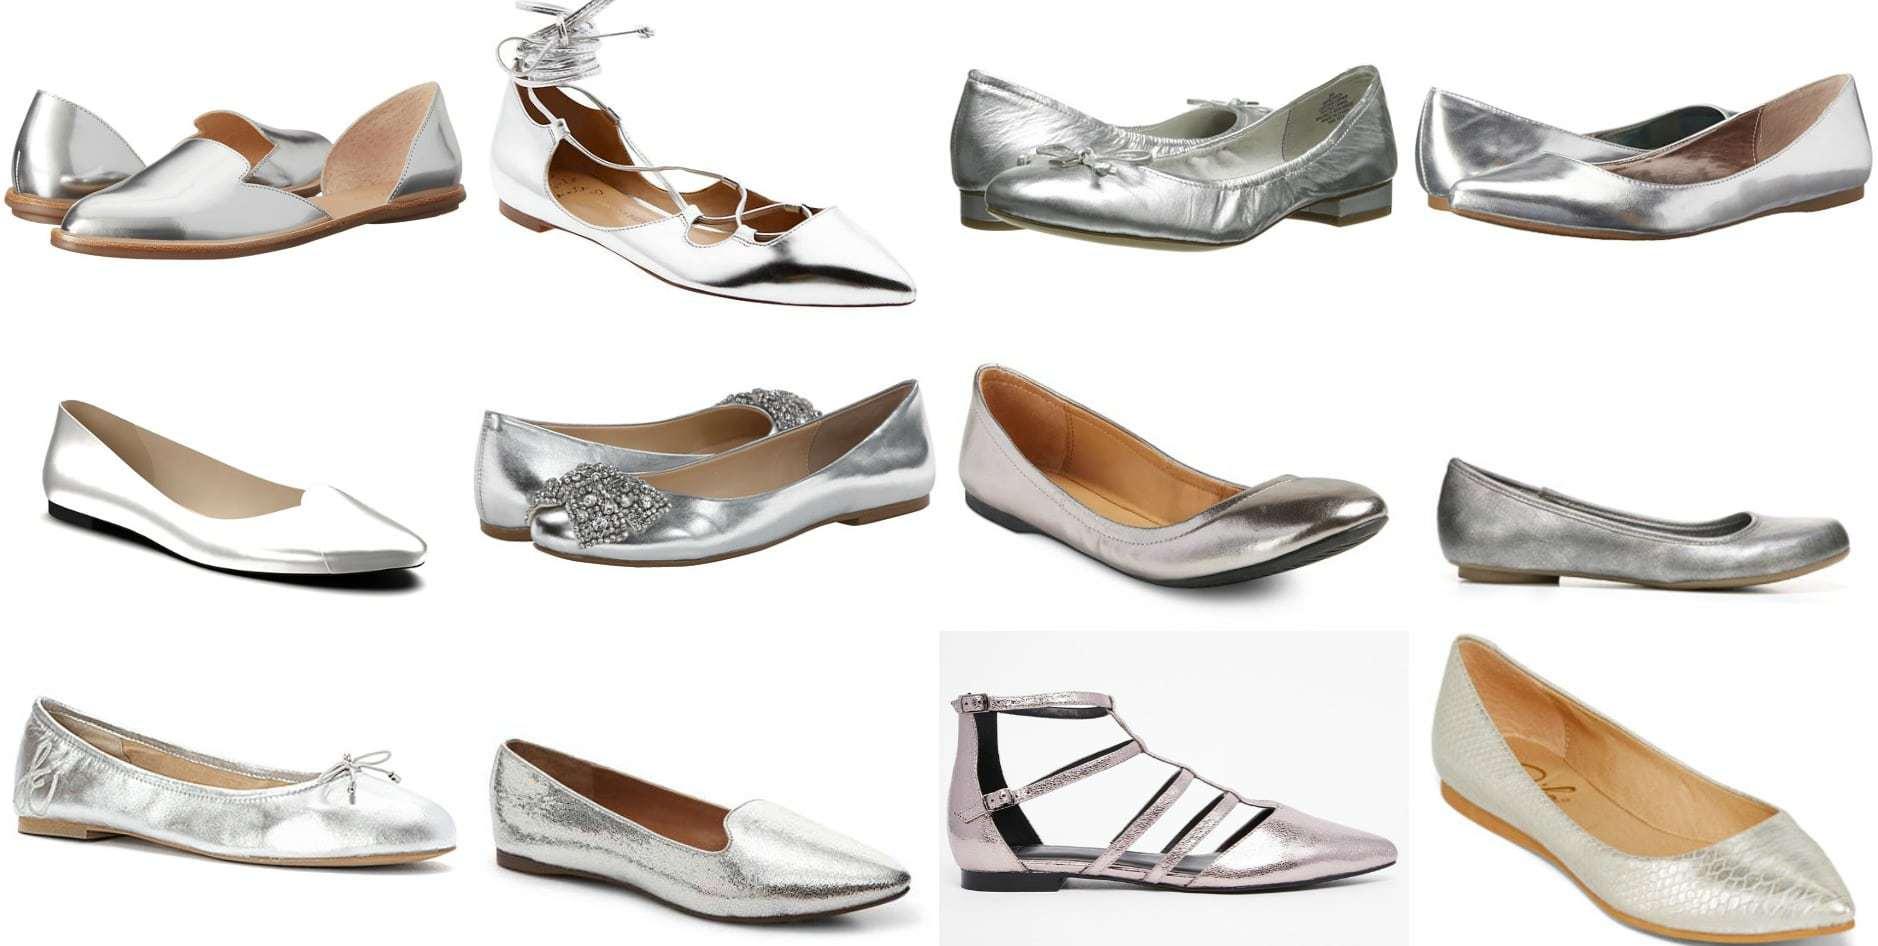 Wardrobe Oxygen - Silver Flats Trend for 2016 my picks